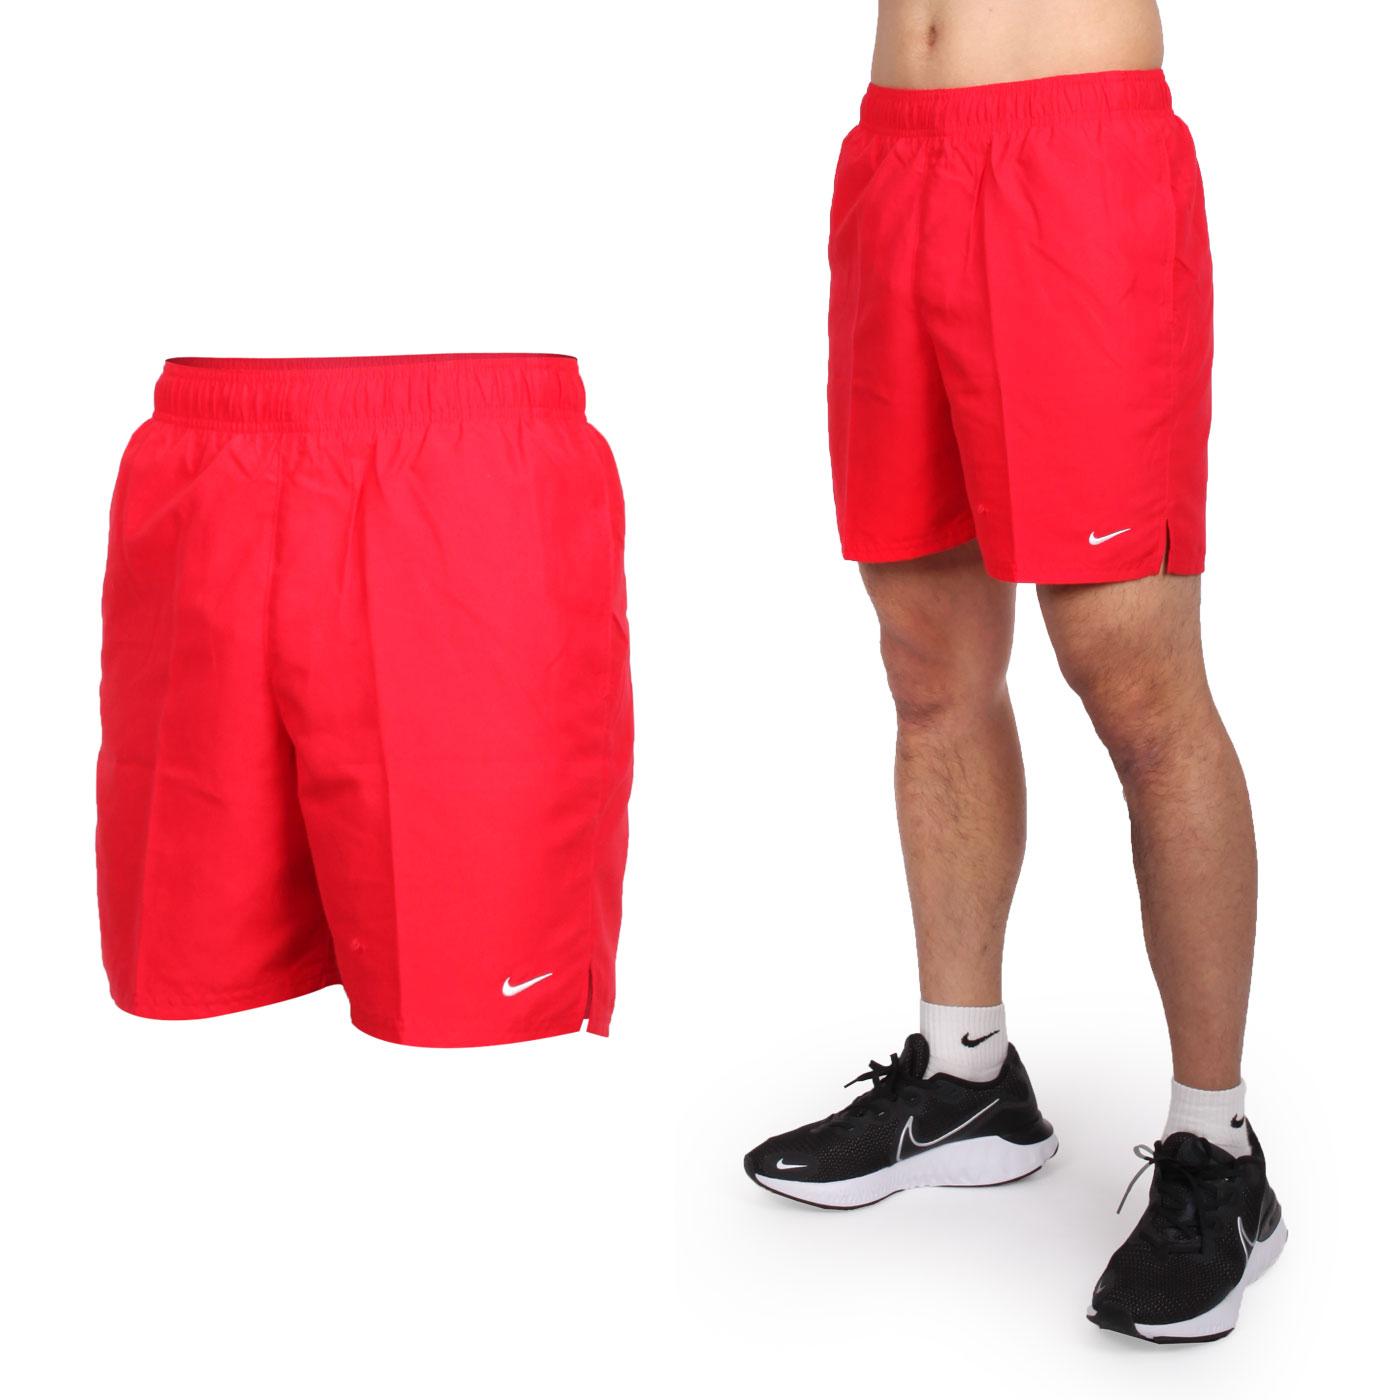 NIKE SWIM 男款七吋海灘褲 NESSA559-440 - 紅白